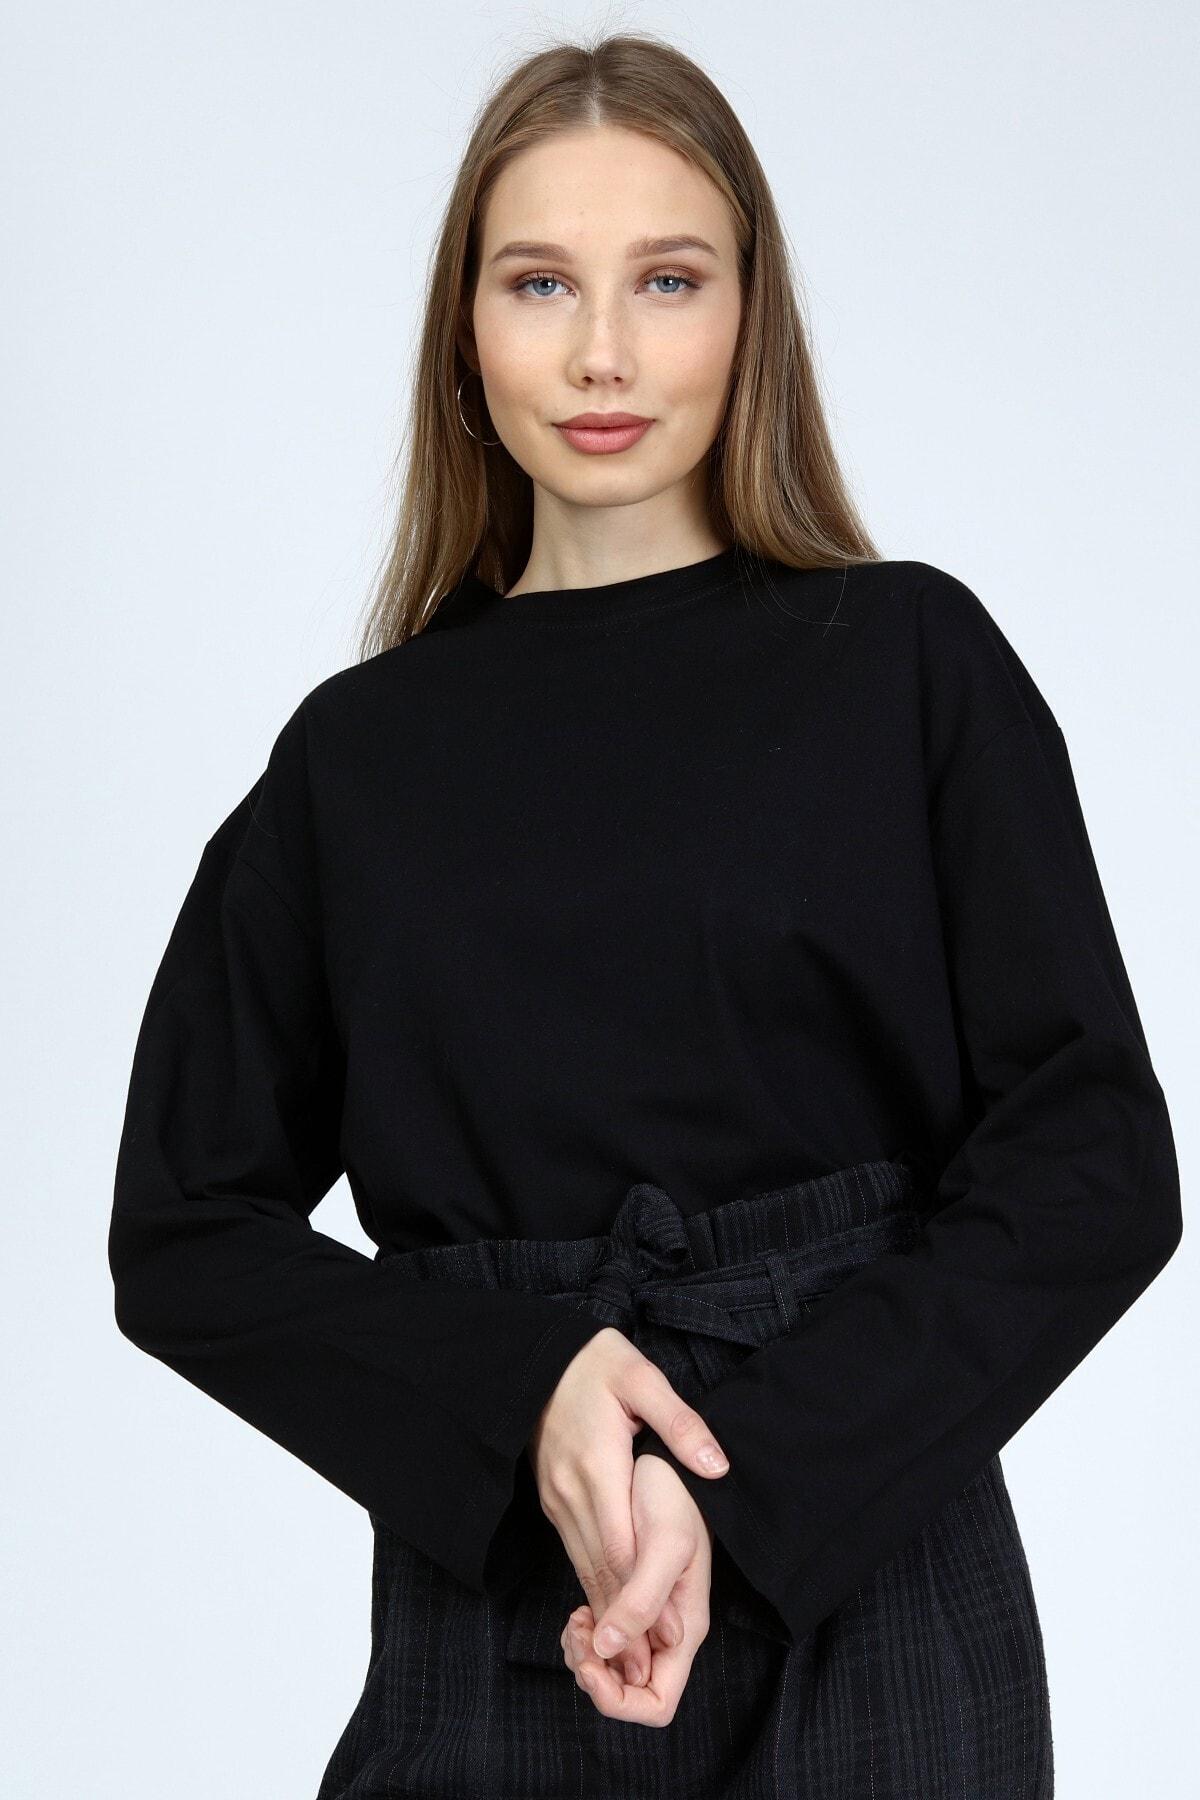 BASICA Kadın Siyah Uzun Kollu Bisiklet Yaka Basic Oversize T-shirt 2